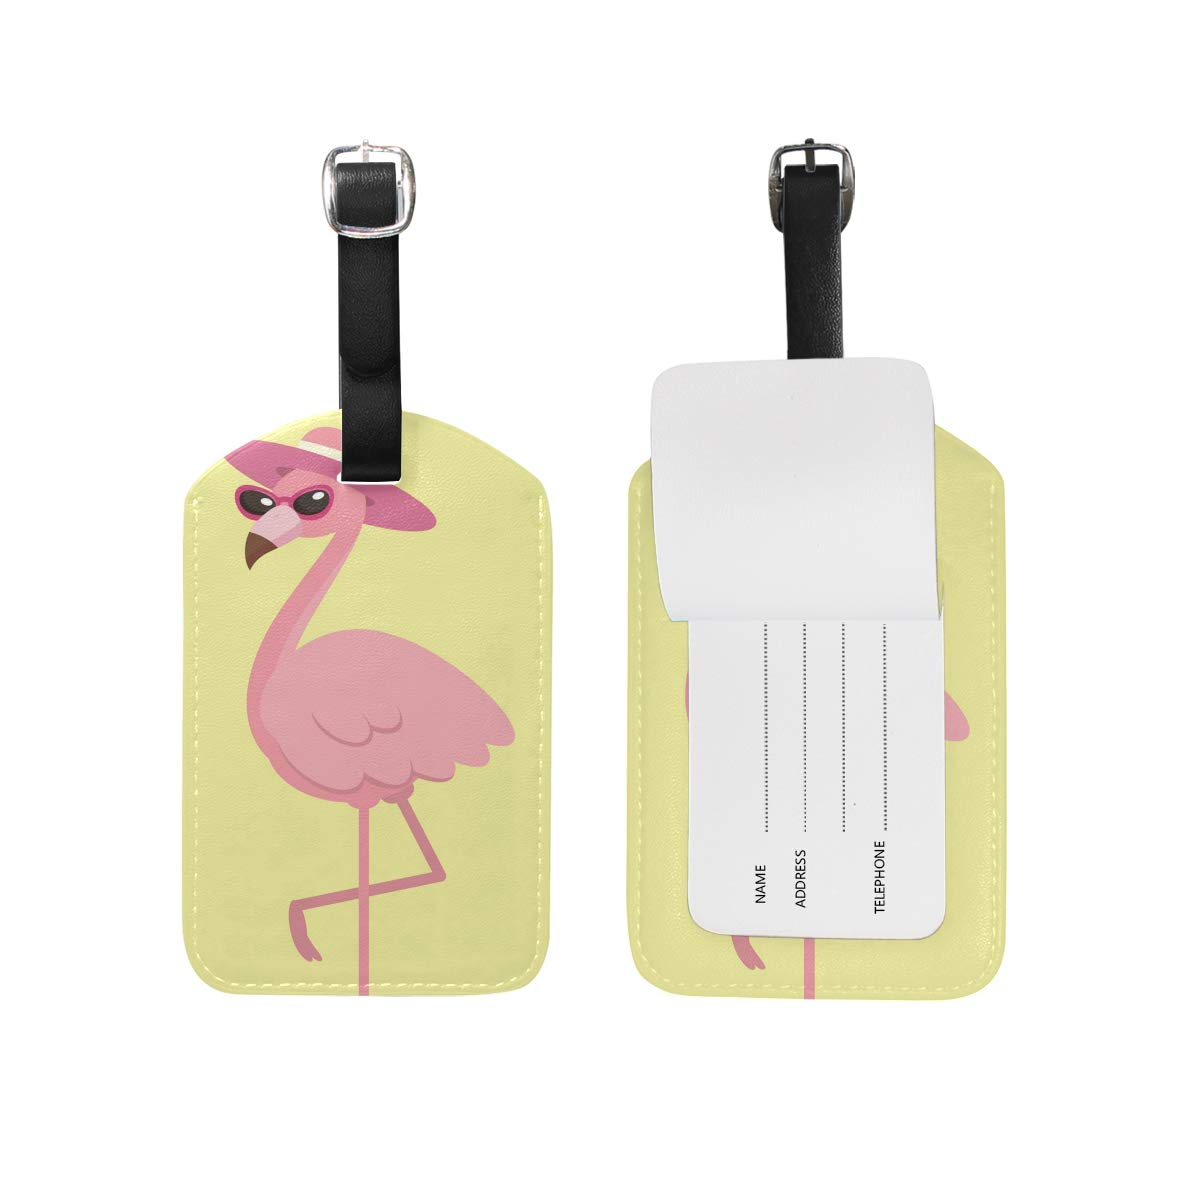 Saobao Travel Luggage Tag Cute Pink Flamingo PU Leather Baggage Travel ID